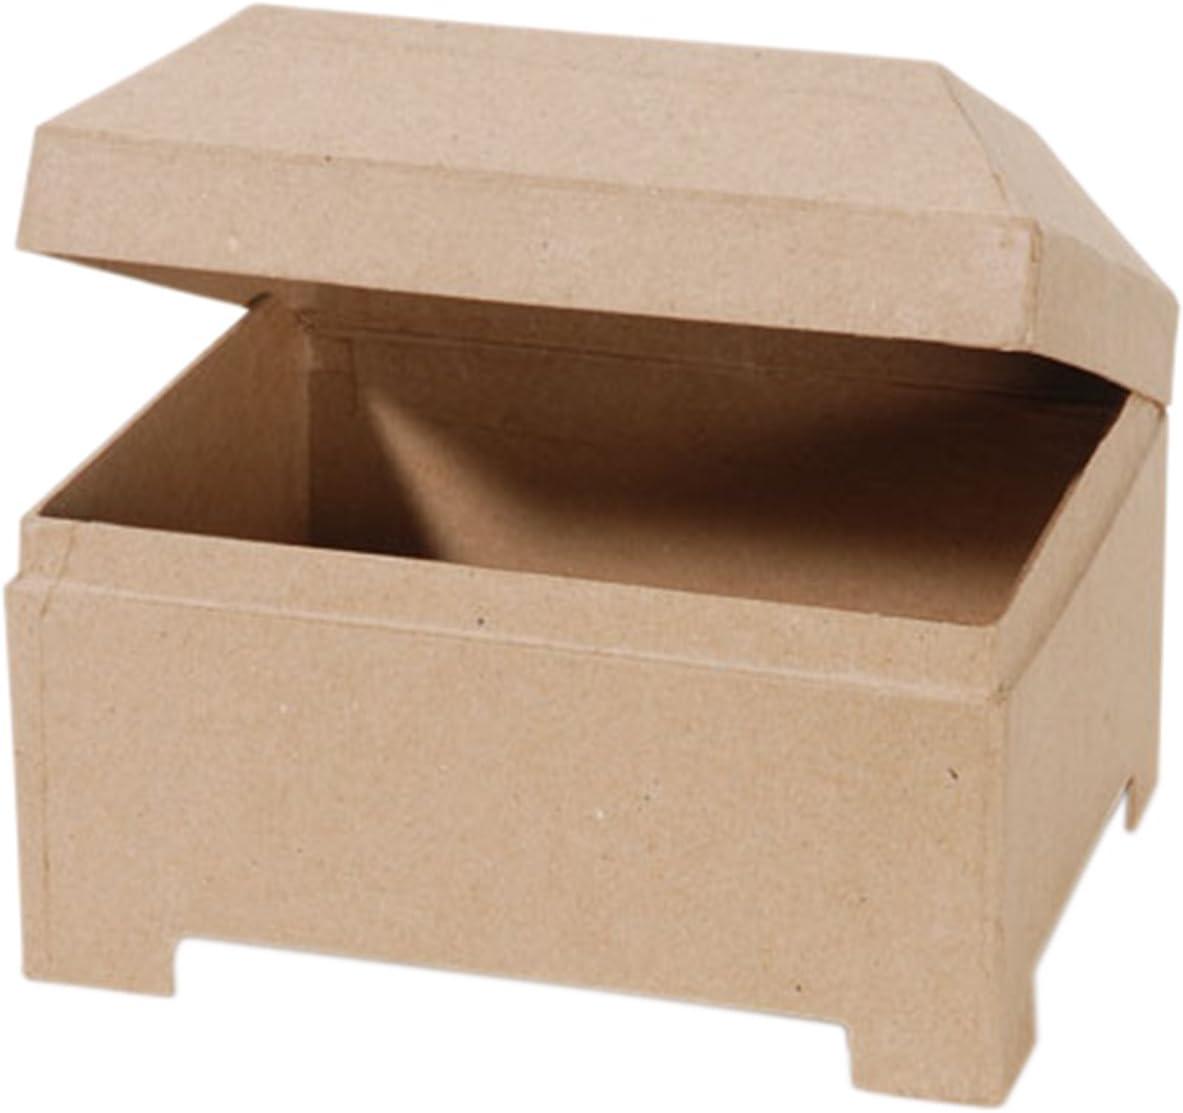 7 x 5.5-Inch Darice 2873-216 Paper-Mache Jewel Box